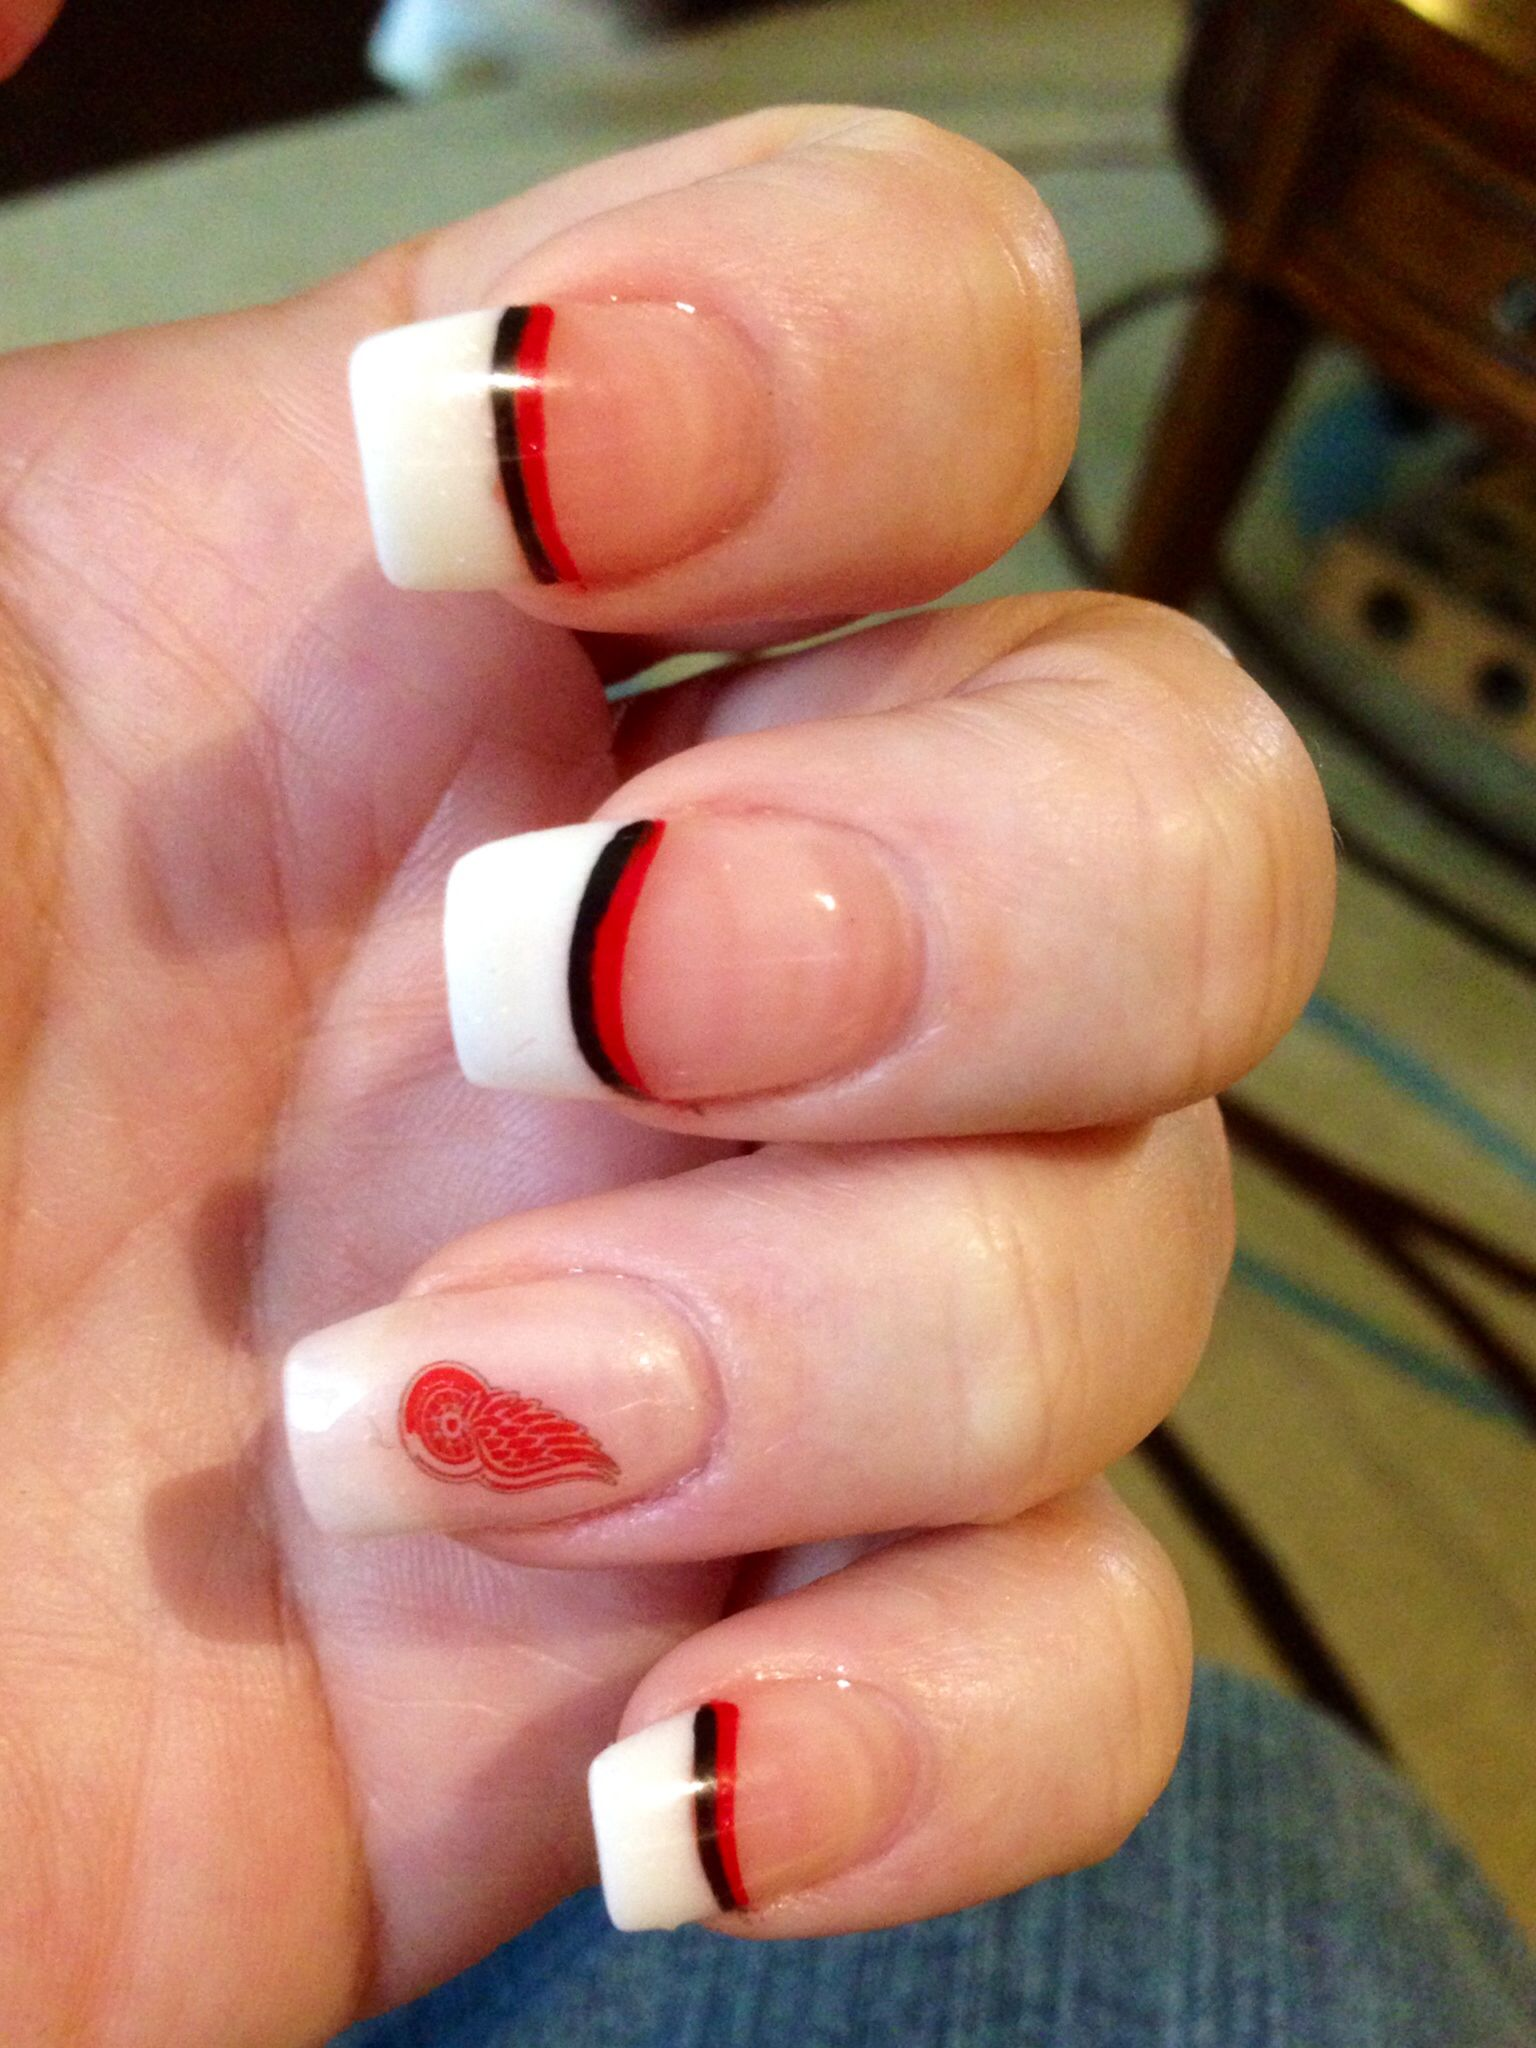 Red wings nails nails pinterest red wing nail nail and red wings nails prinsesfo Choice Image